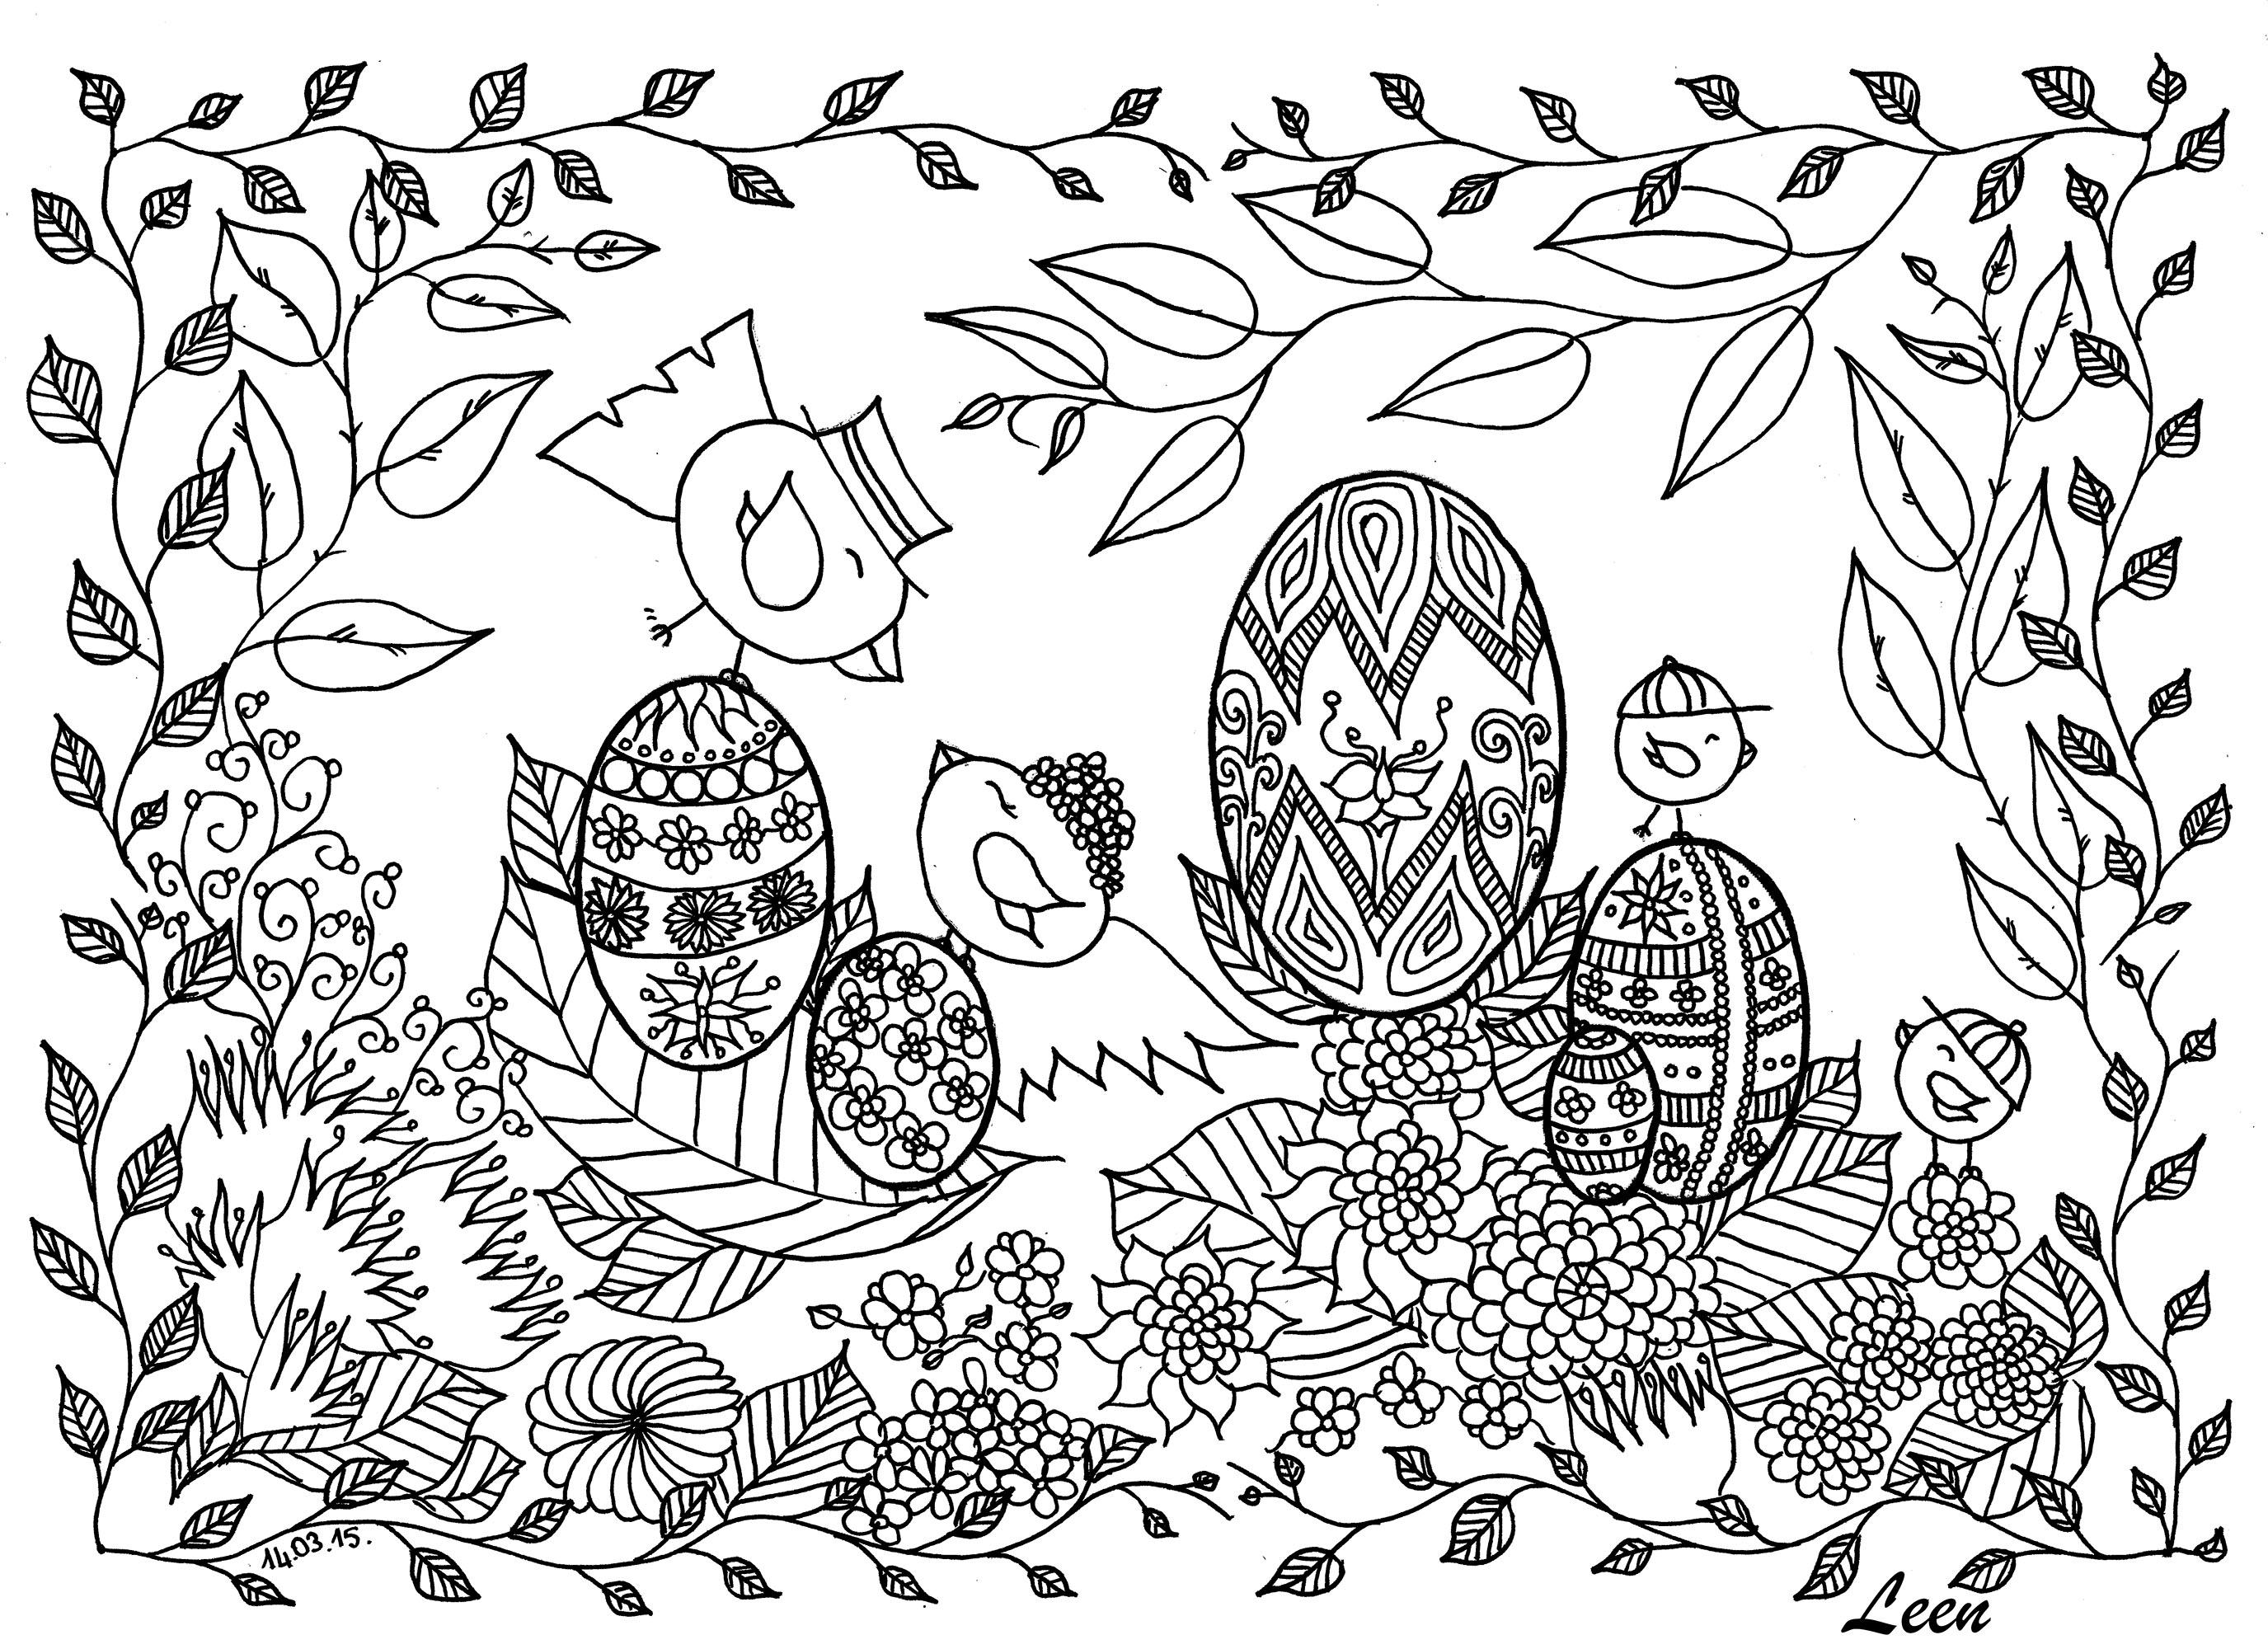 Pascua de resurreccion 56357 - Pascua de Resurrección - Colorear ...